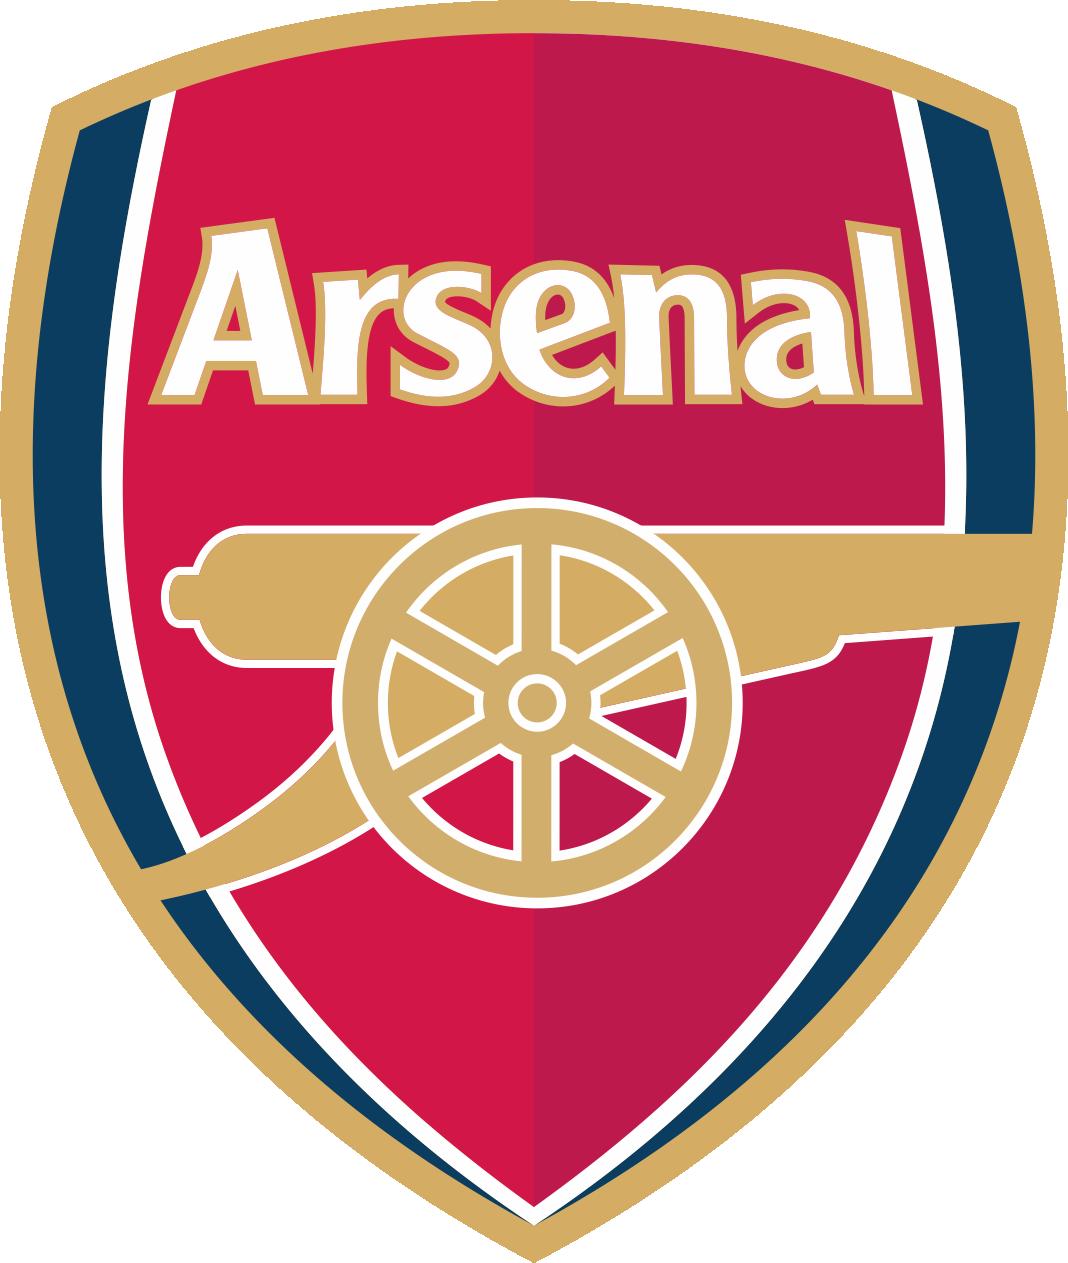 Arsenal fc logo clipart - Arsenal Fc Vector PNG